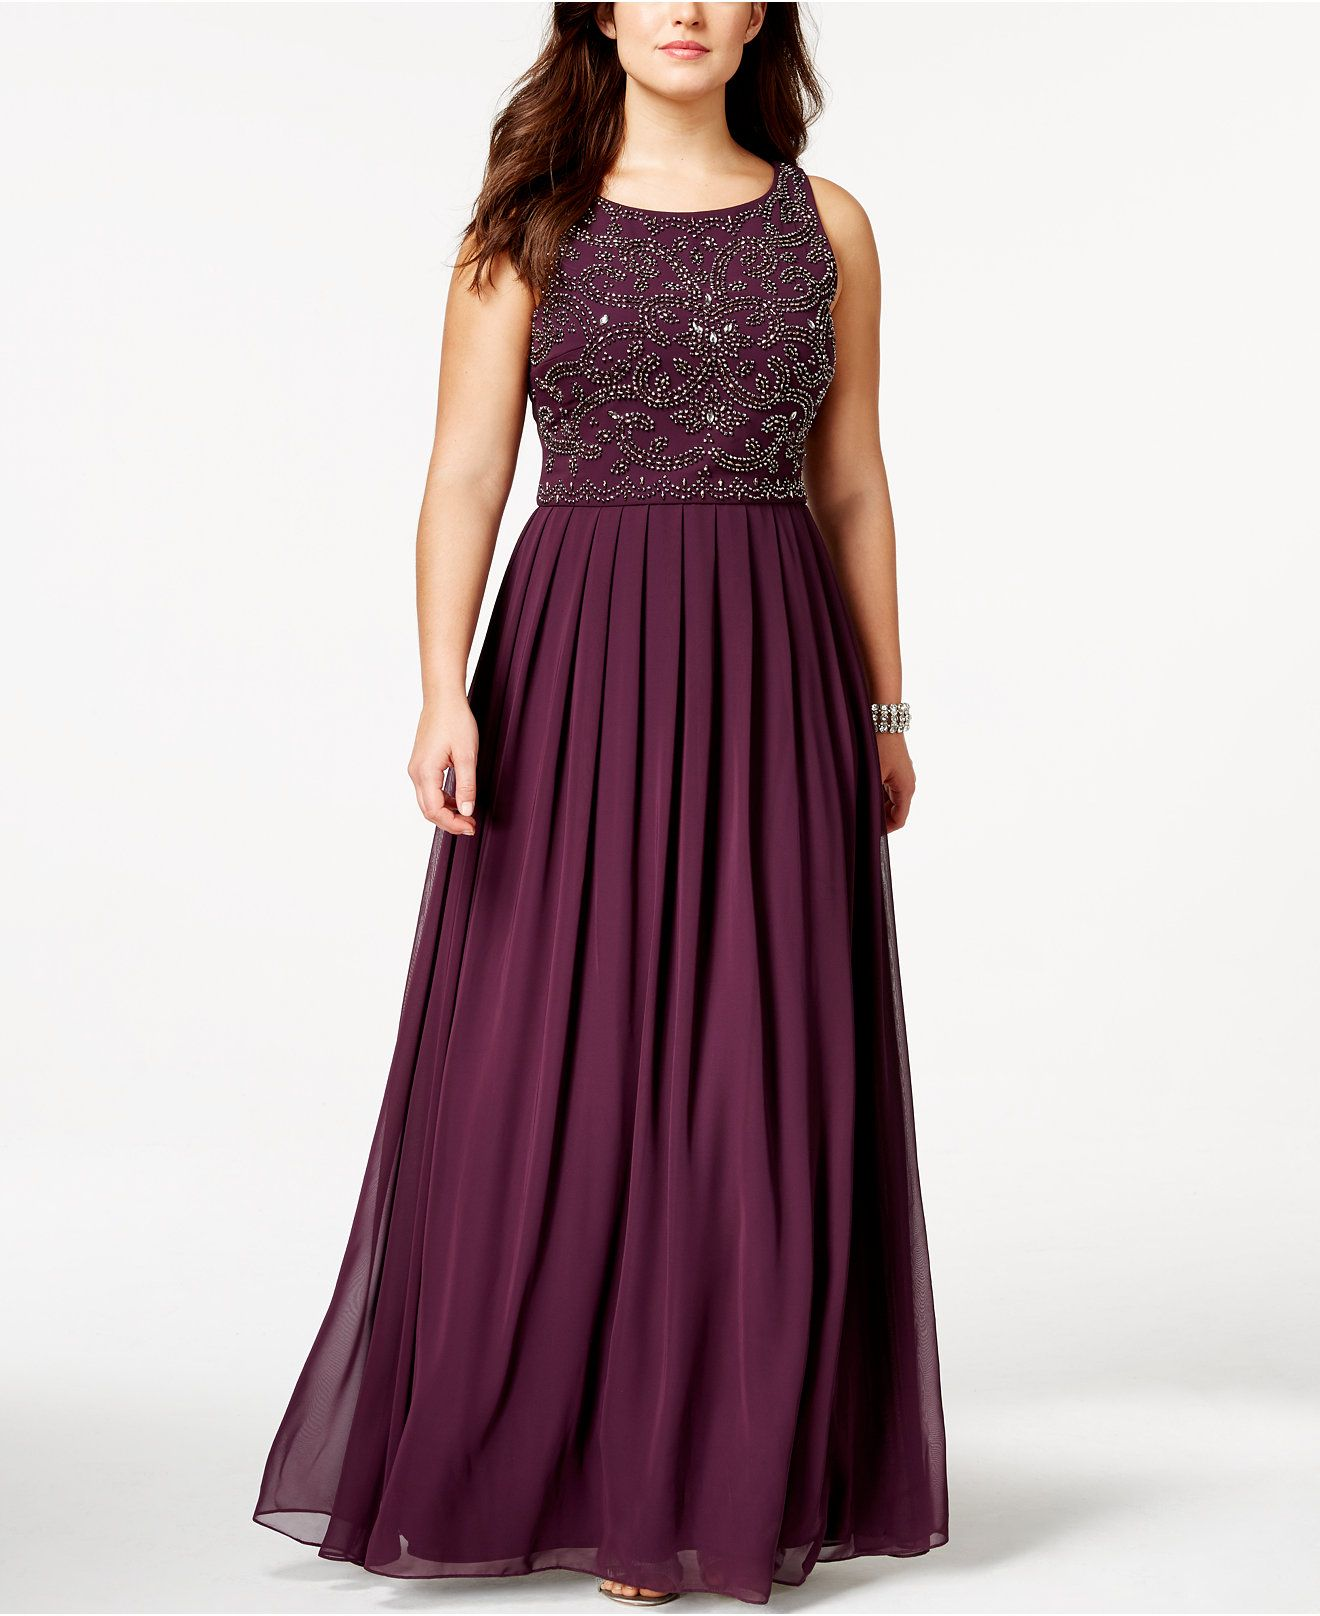 Xscape Plus Size Beaded Empire Pleated Gown Dresses Women